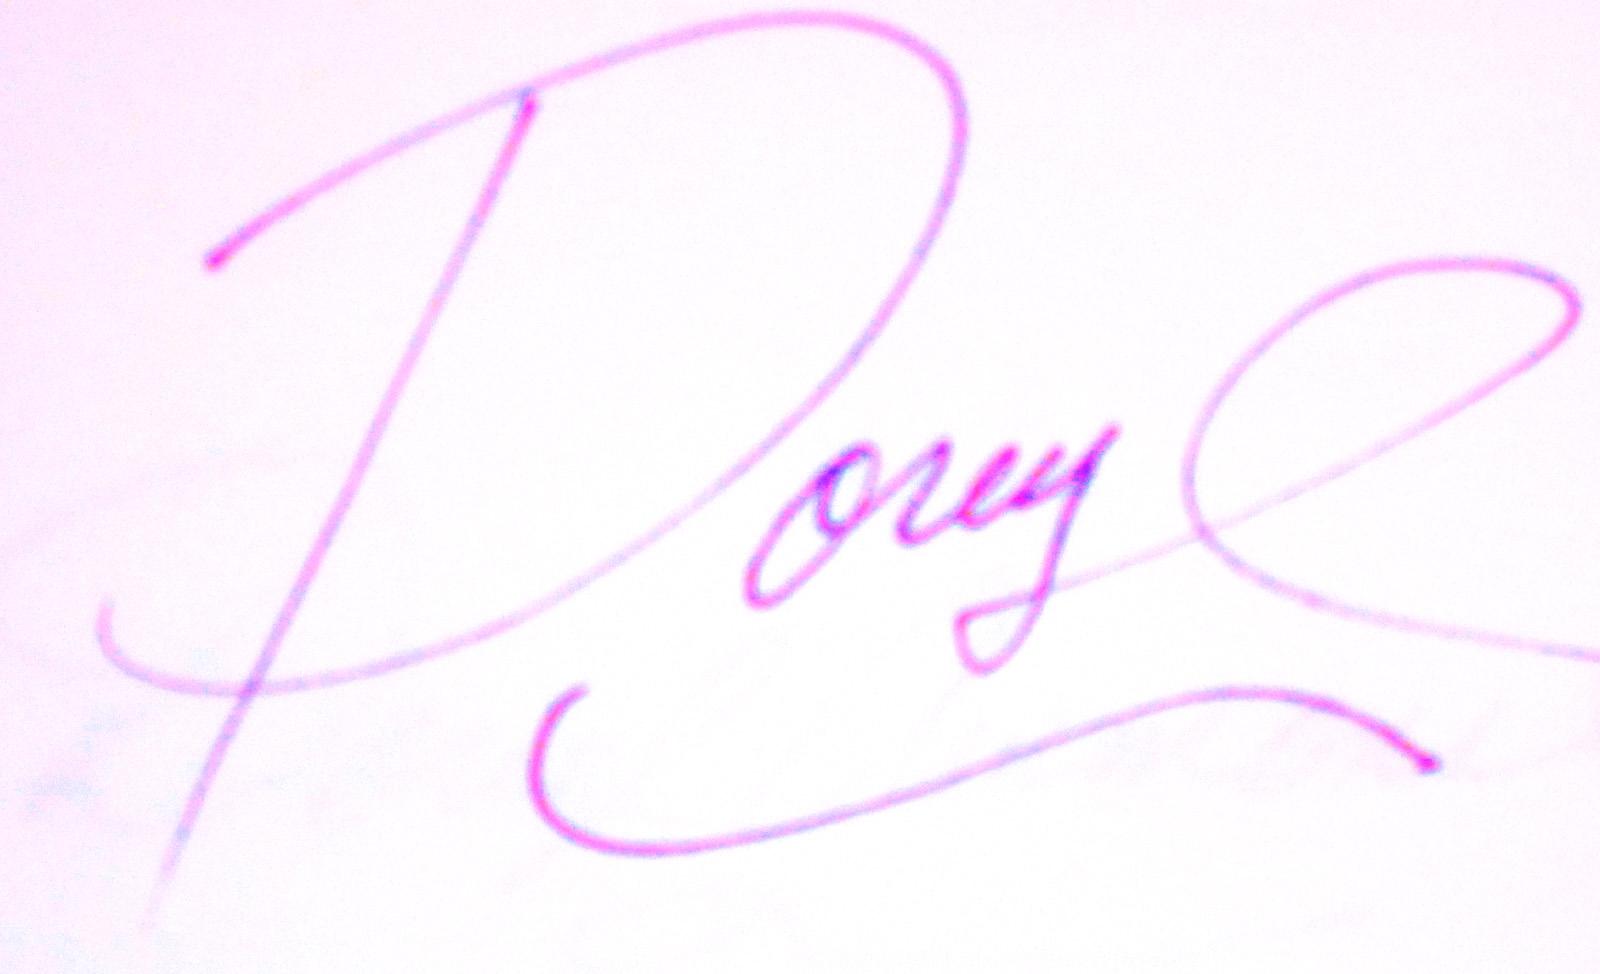 Doreyl Ammons Cain Signature